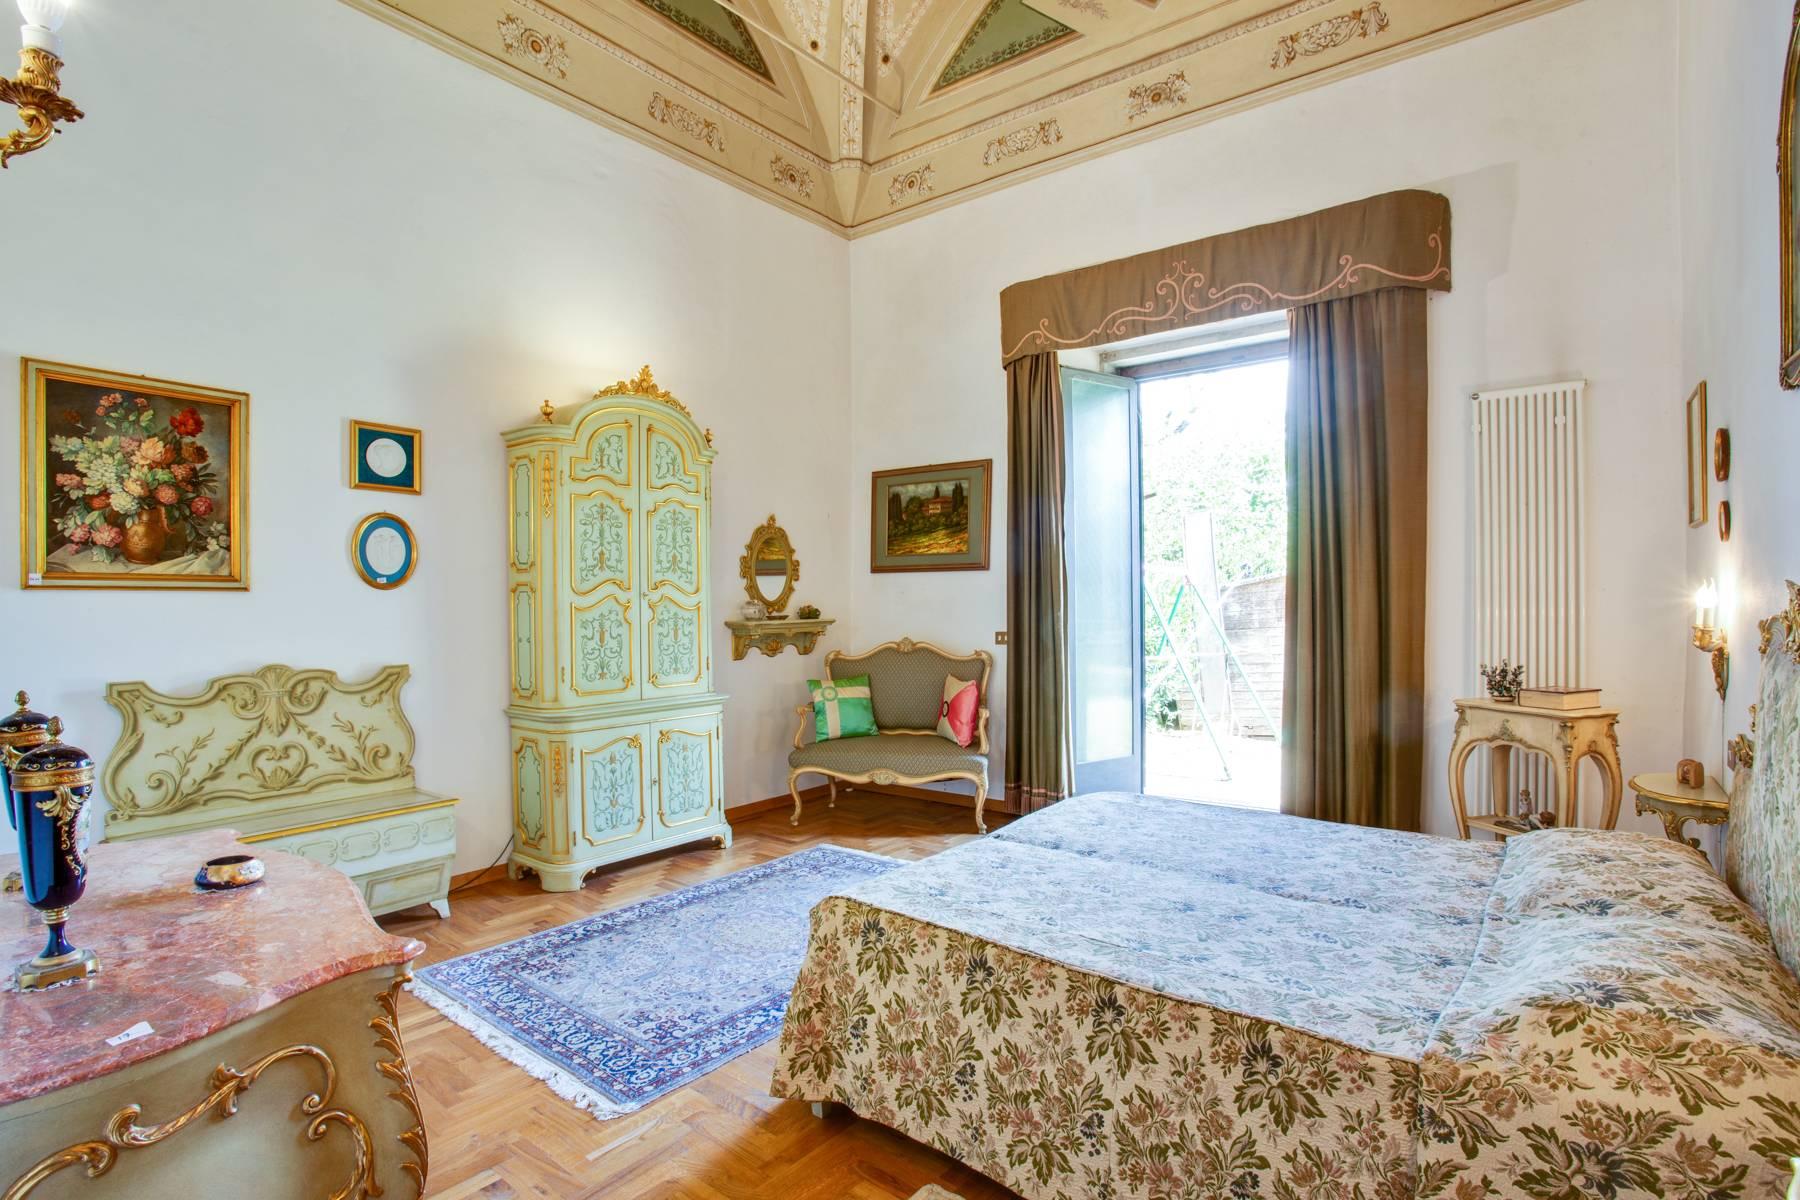 Appartamento in Vendita a Scandicci: 5 locali, 170 mq - Foto 10